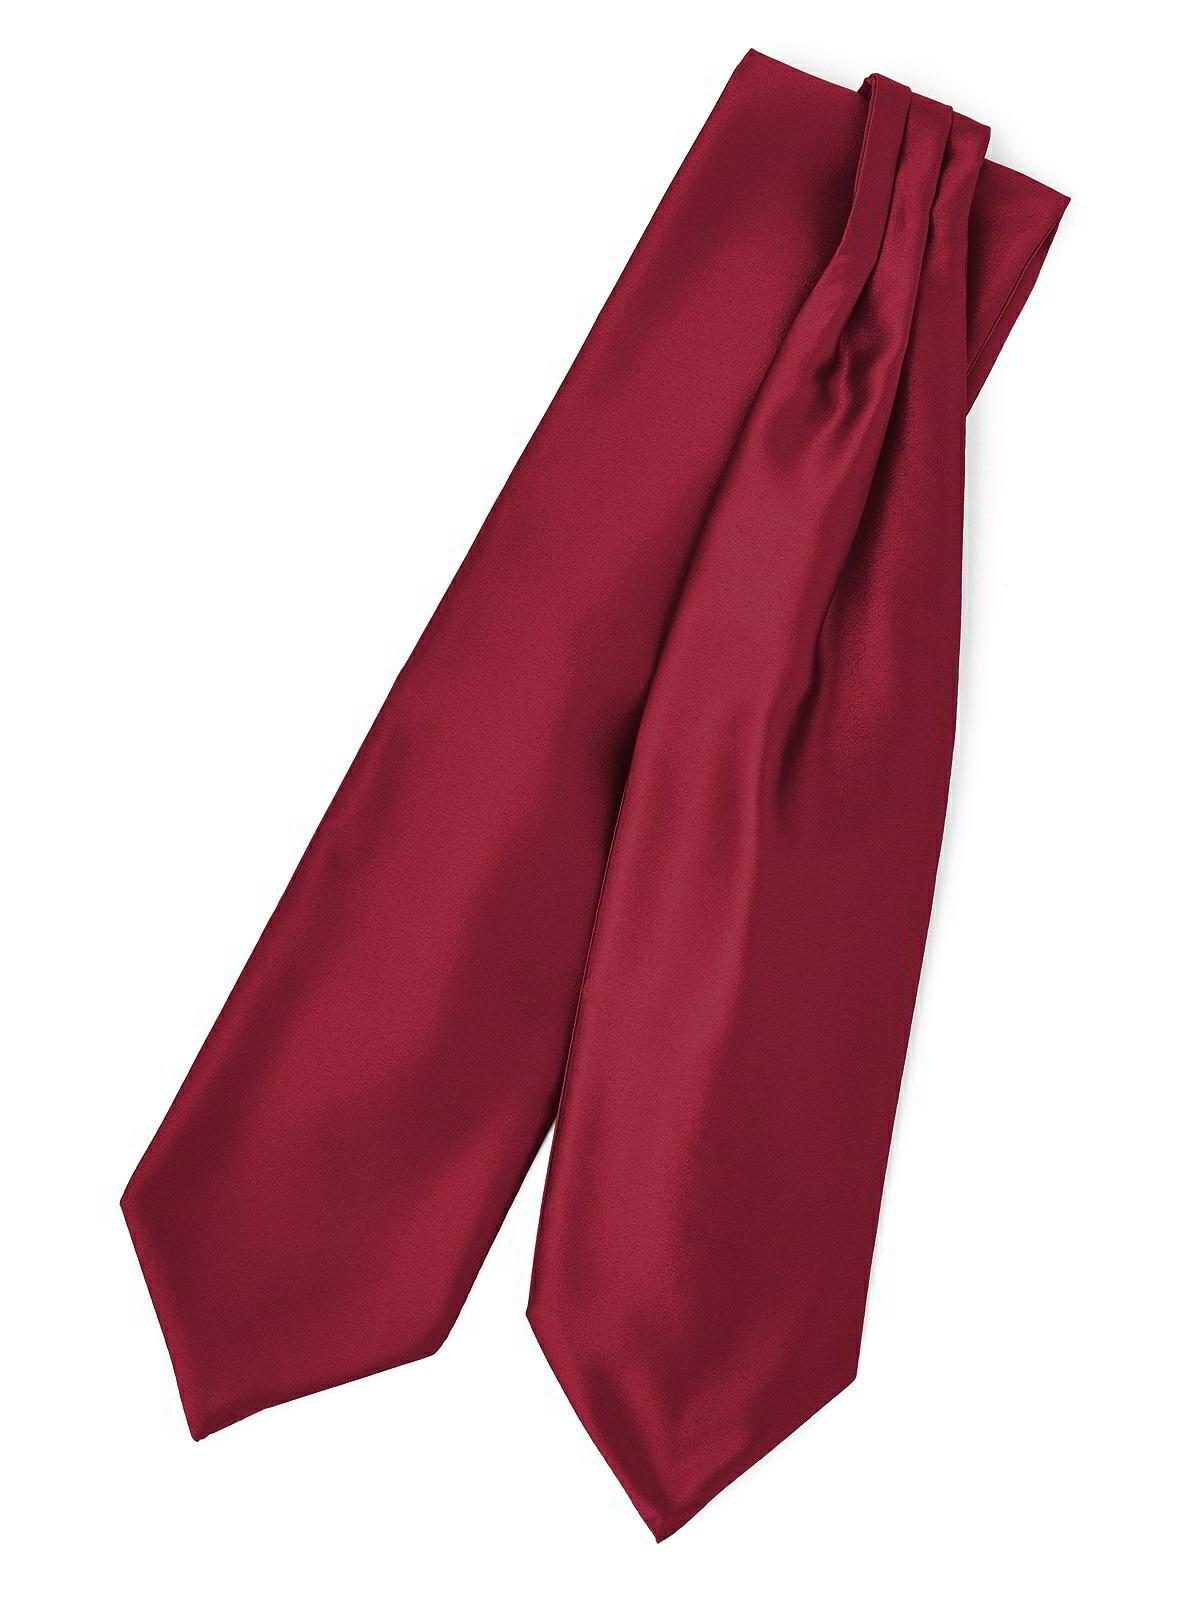 Mens Burgundy Red Satin Wedding Cravat